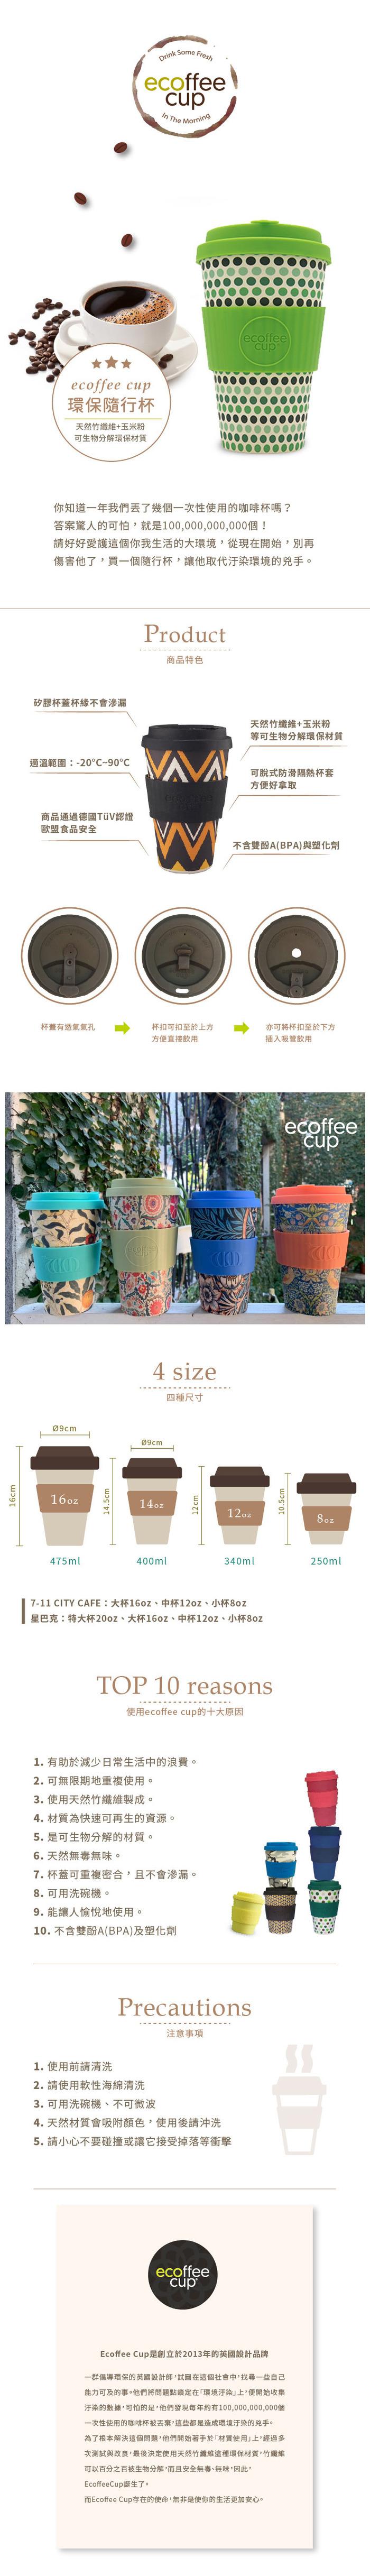 Ecoffee Cup|環保隨行杯14oz-大海藍